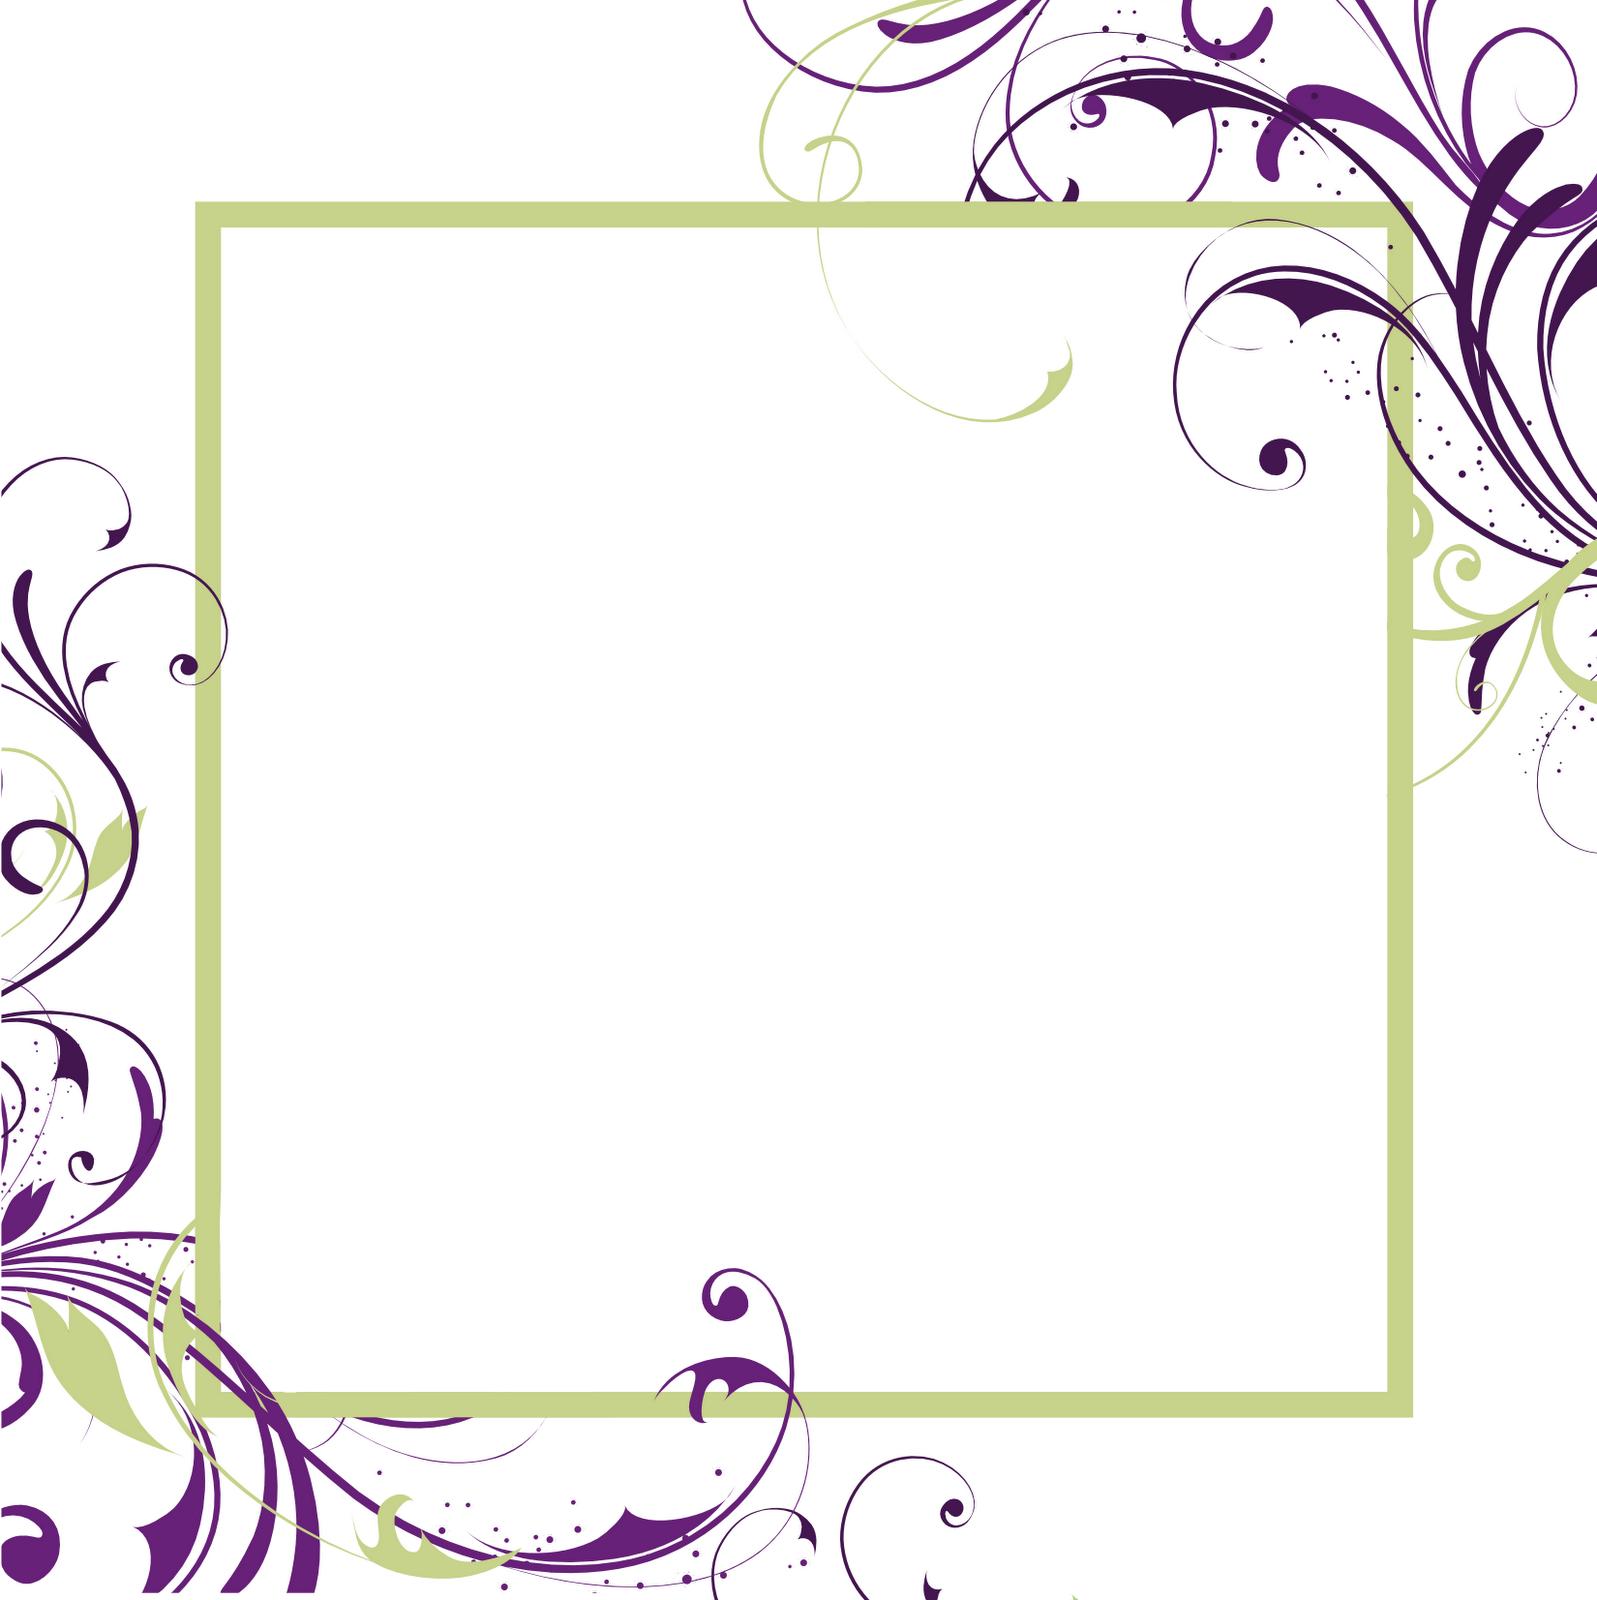 29 Creative Blank Invitation Wedding Template Photo for Blank Invitation Wedding Template